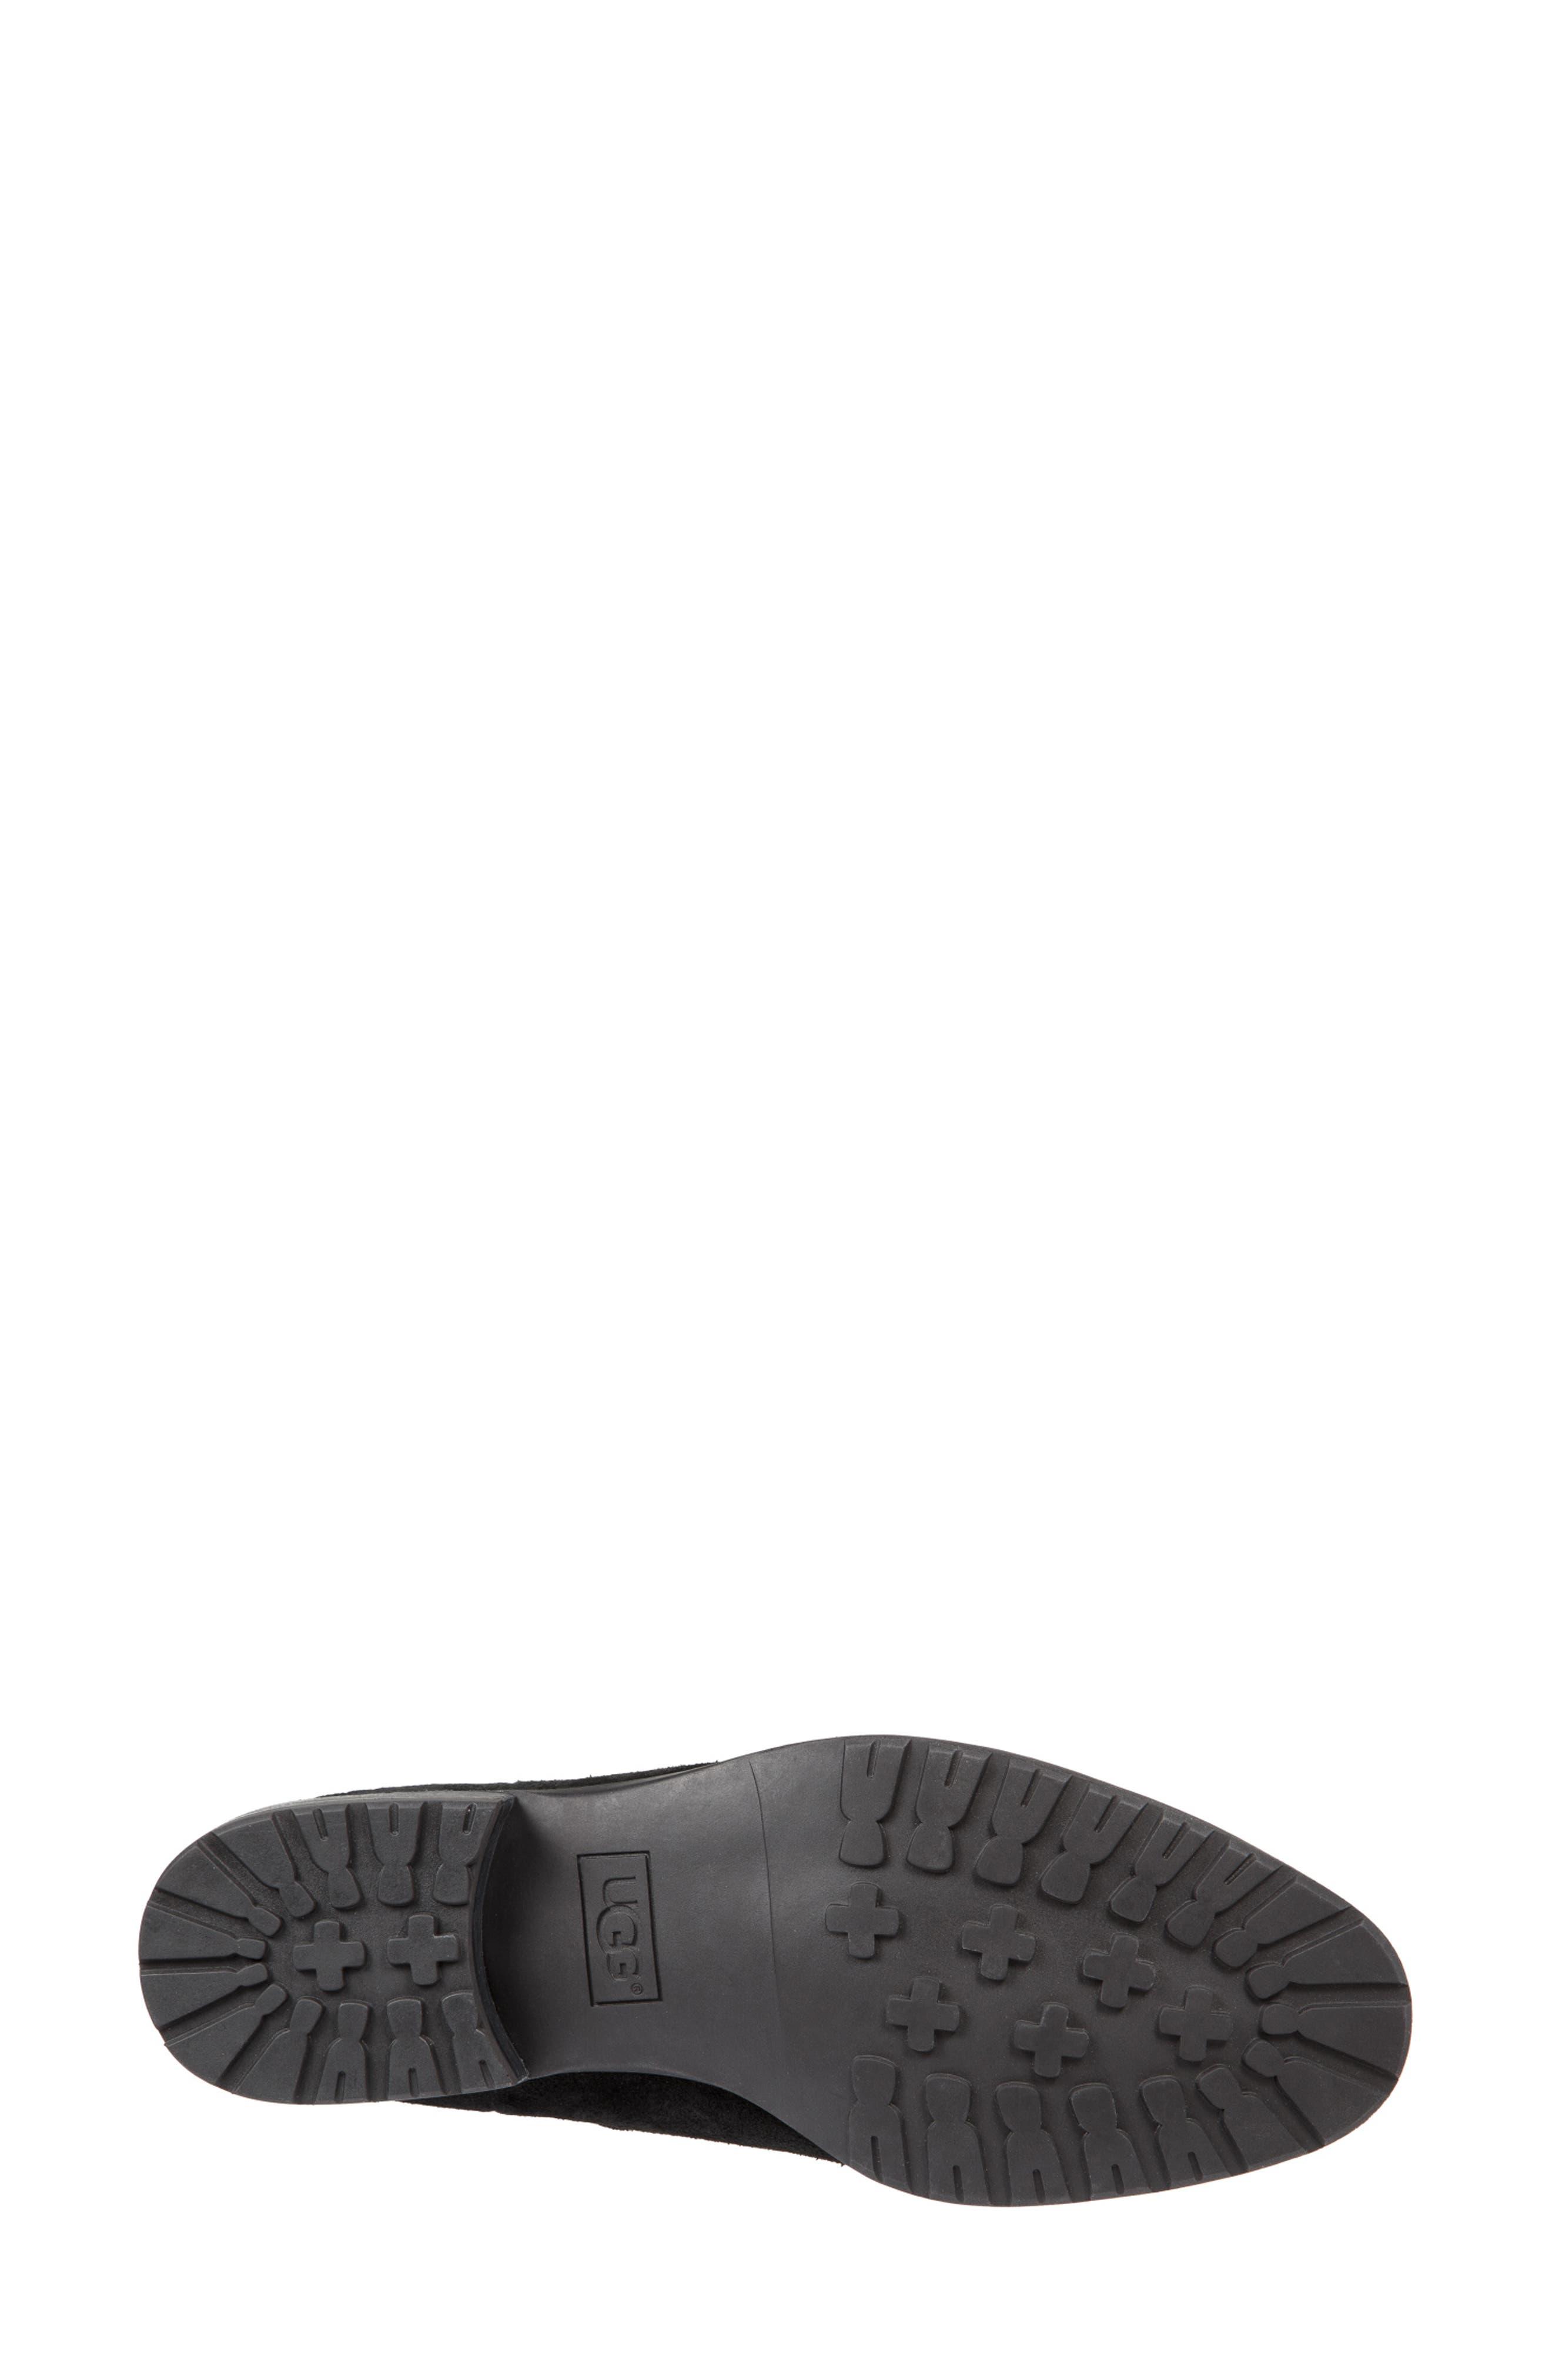 UGG<SUP>®</SUP>, Hillhurst Chelsea Boot, Alternate thumbnail 5, color, 001